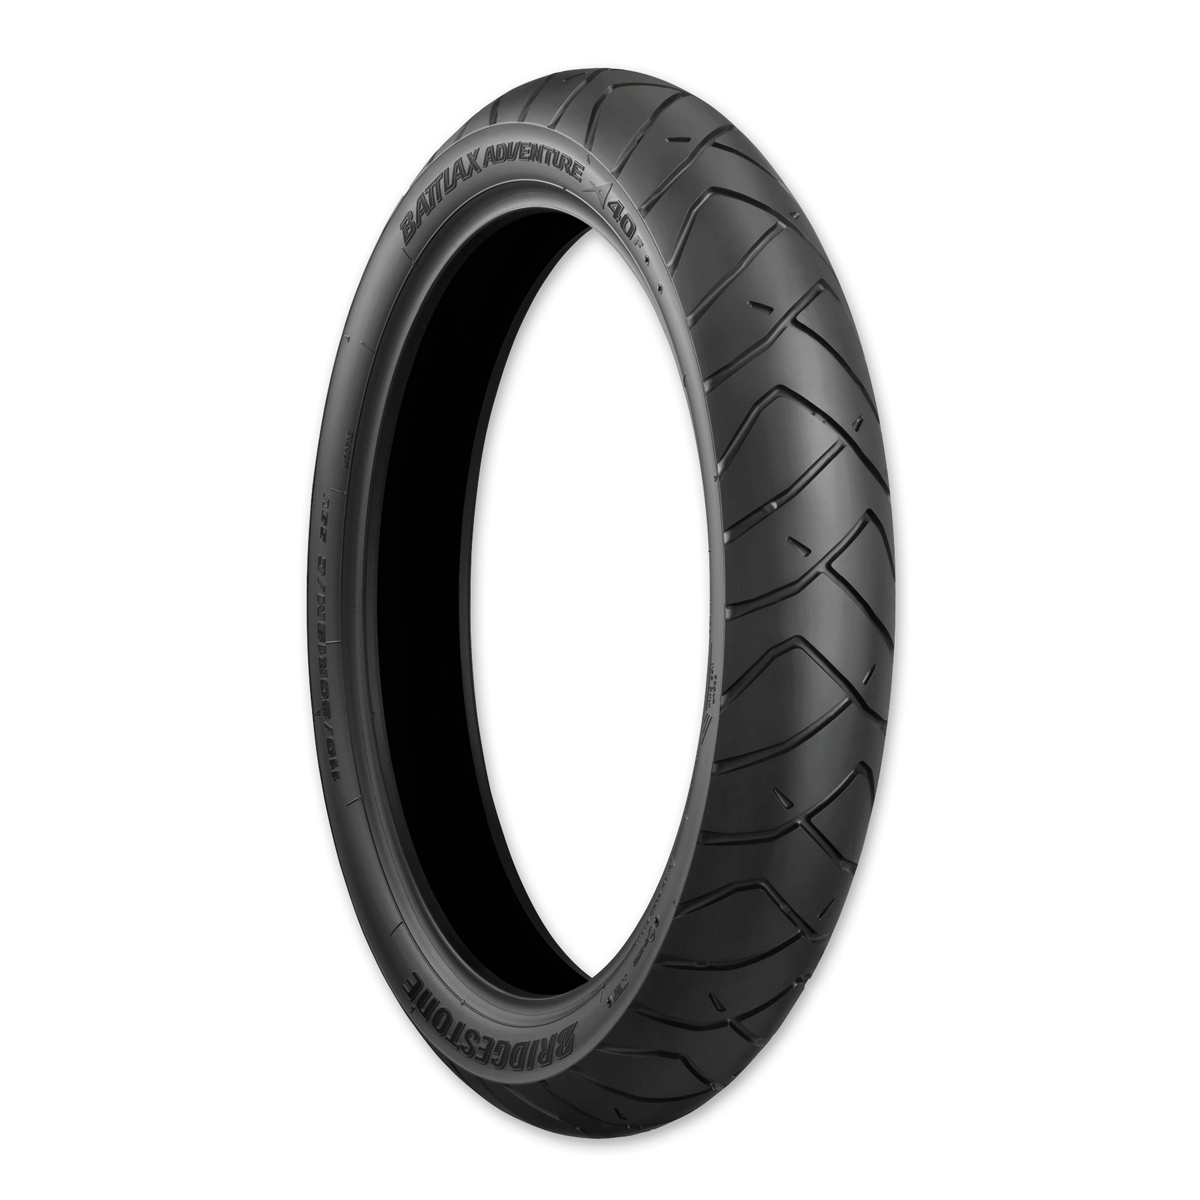 Bridgestone A40 110/80R19 TL Front Tire